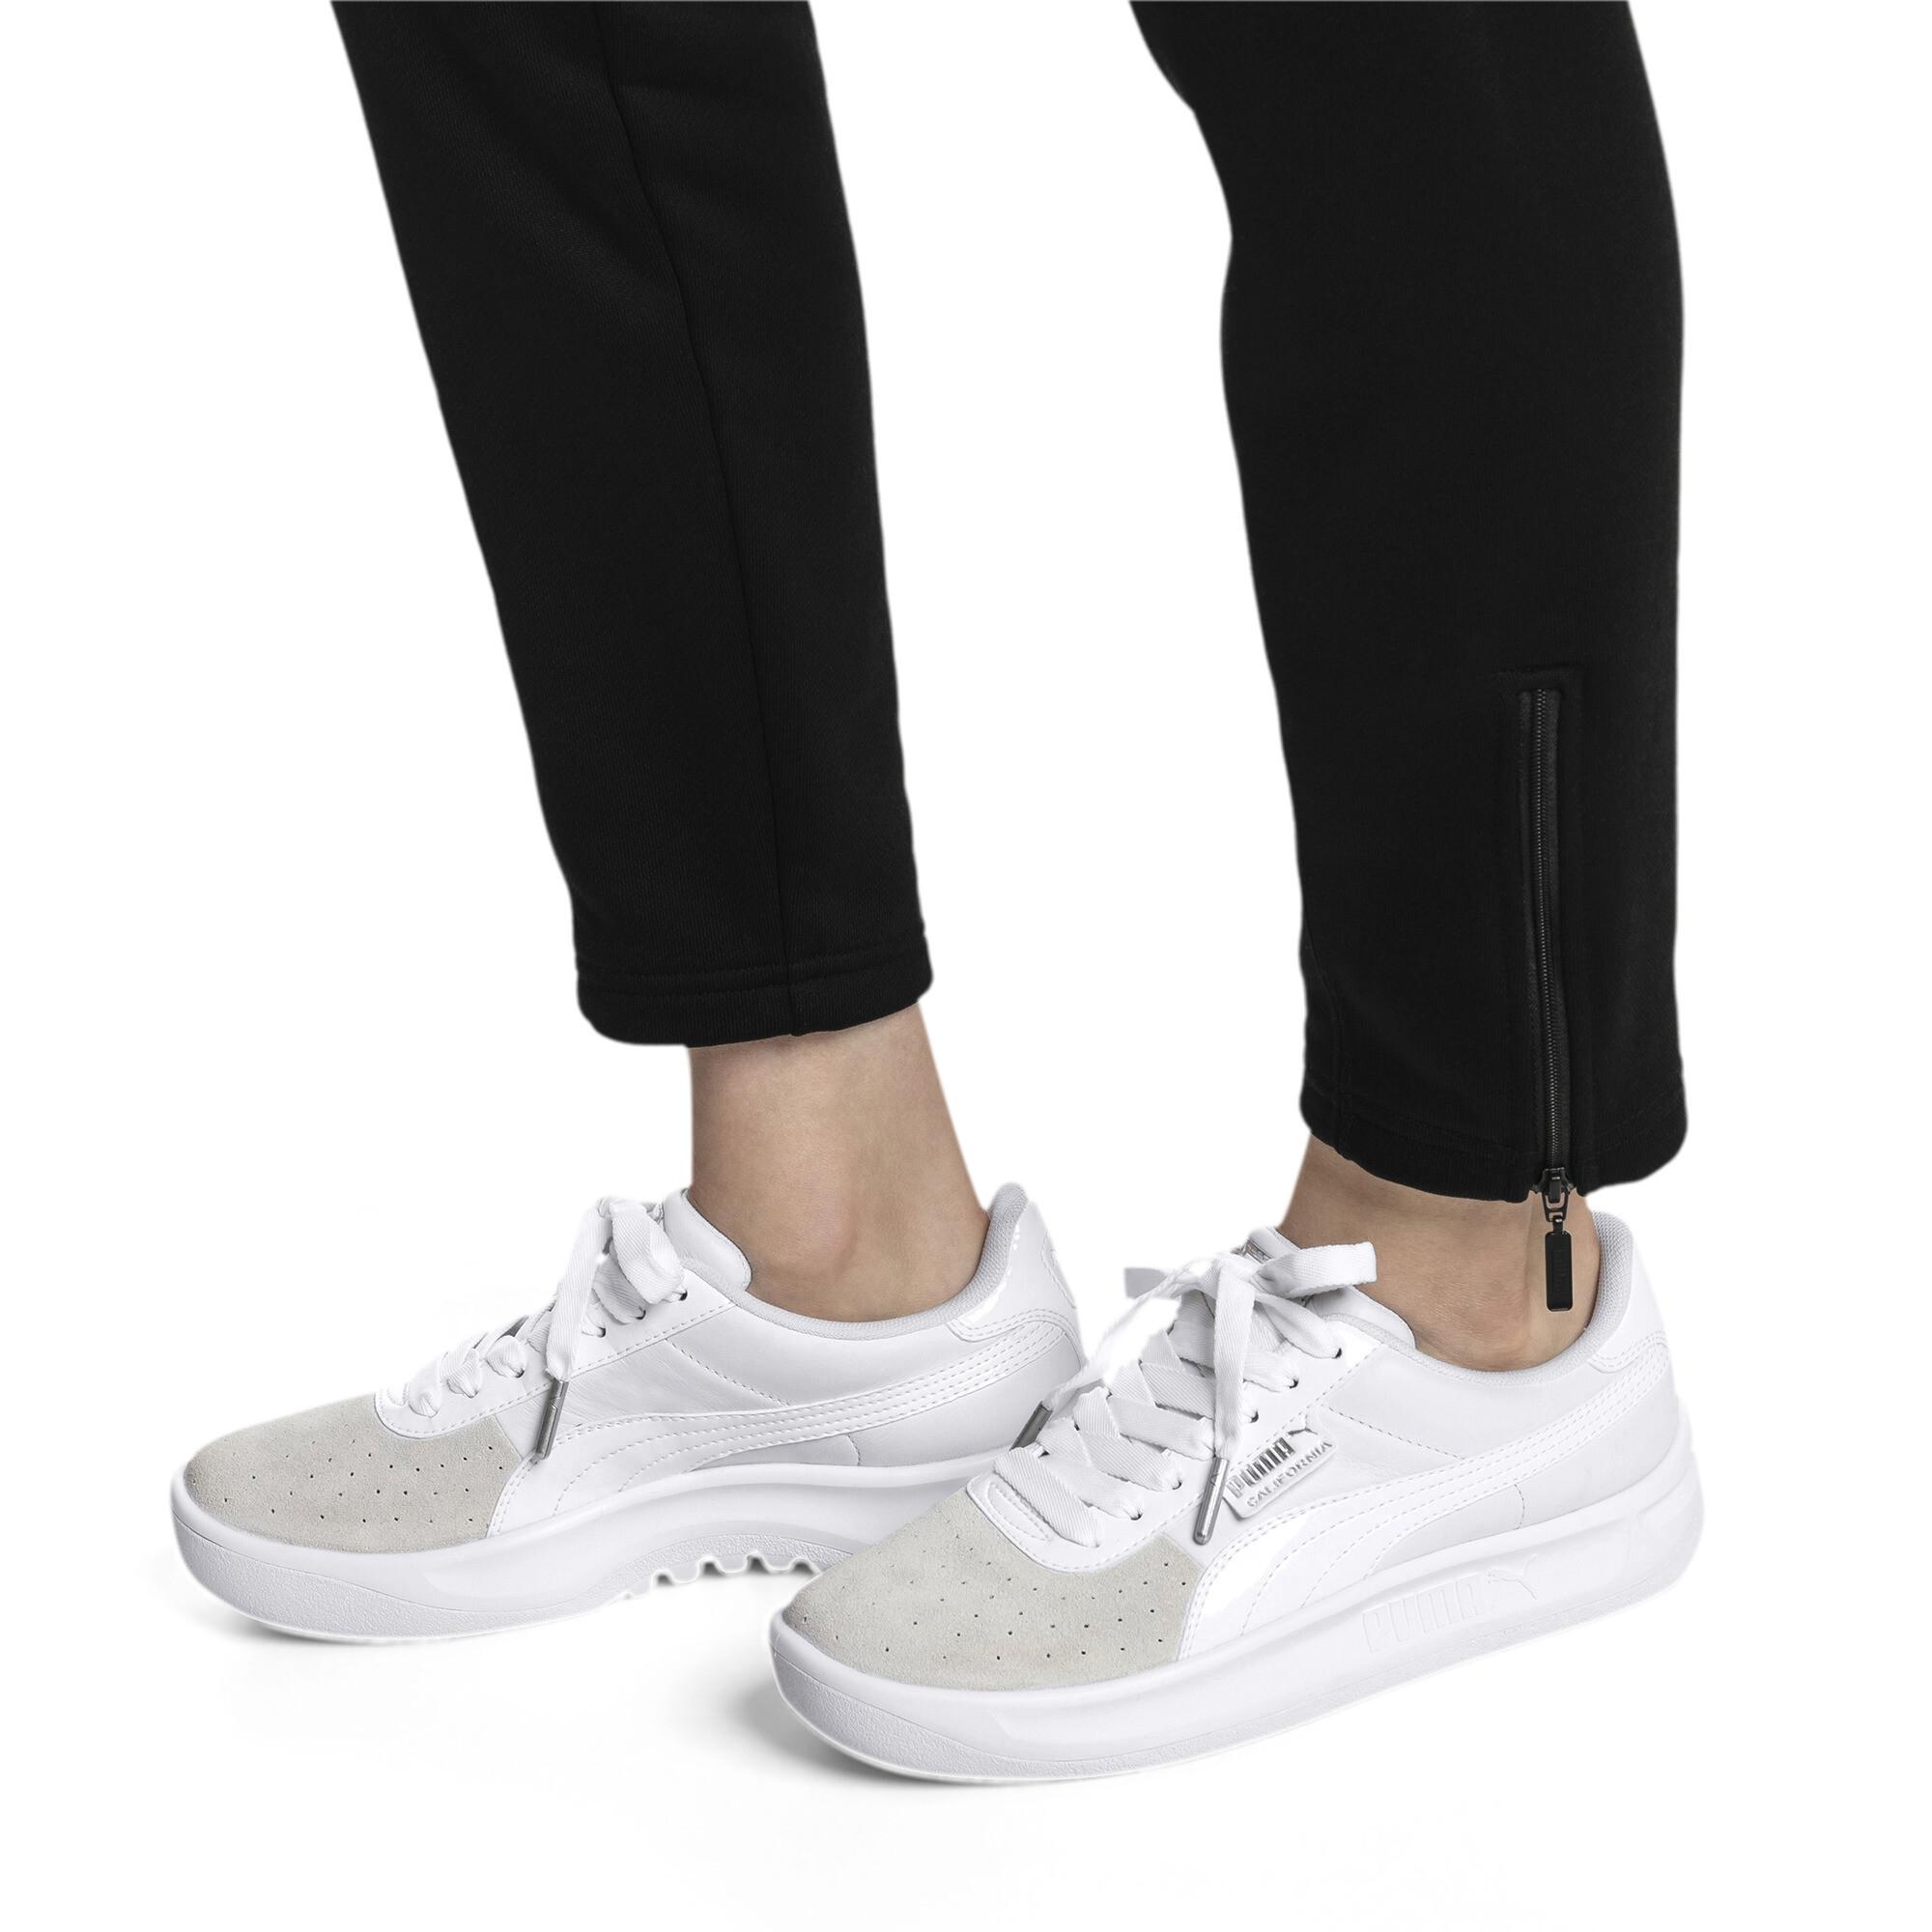 PUMA-Women-039-s-California-Monochrome-Sneakers thumbnail 10